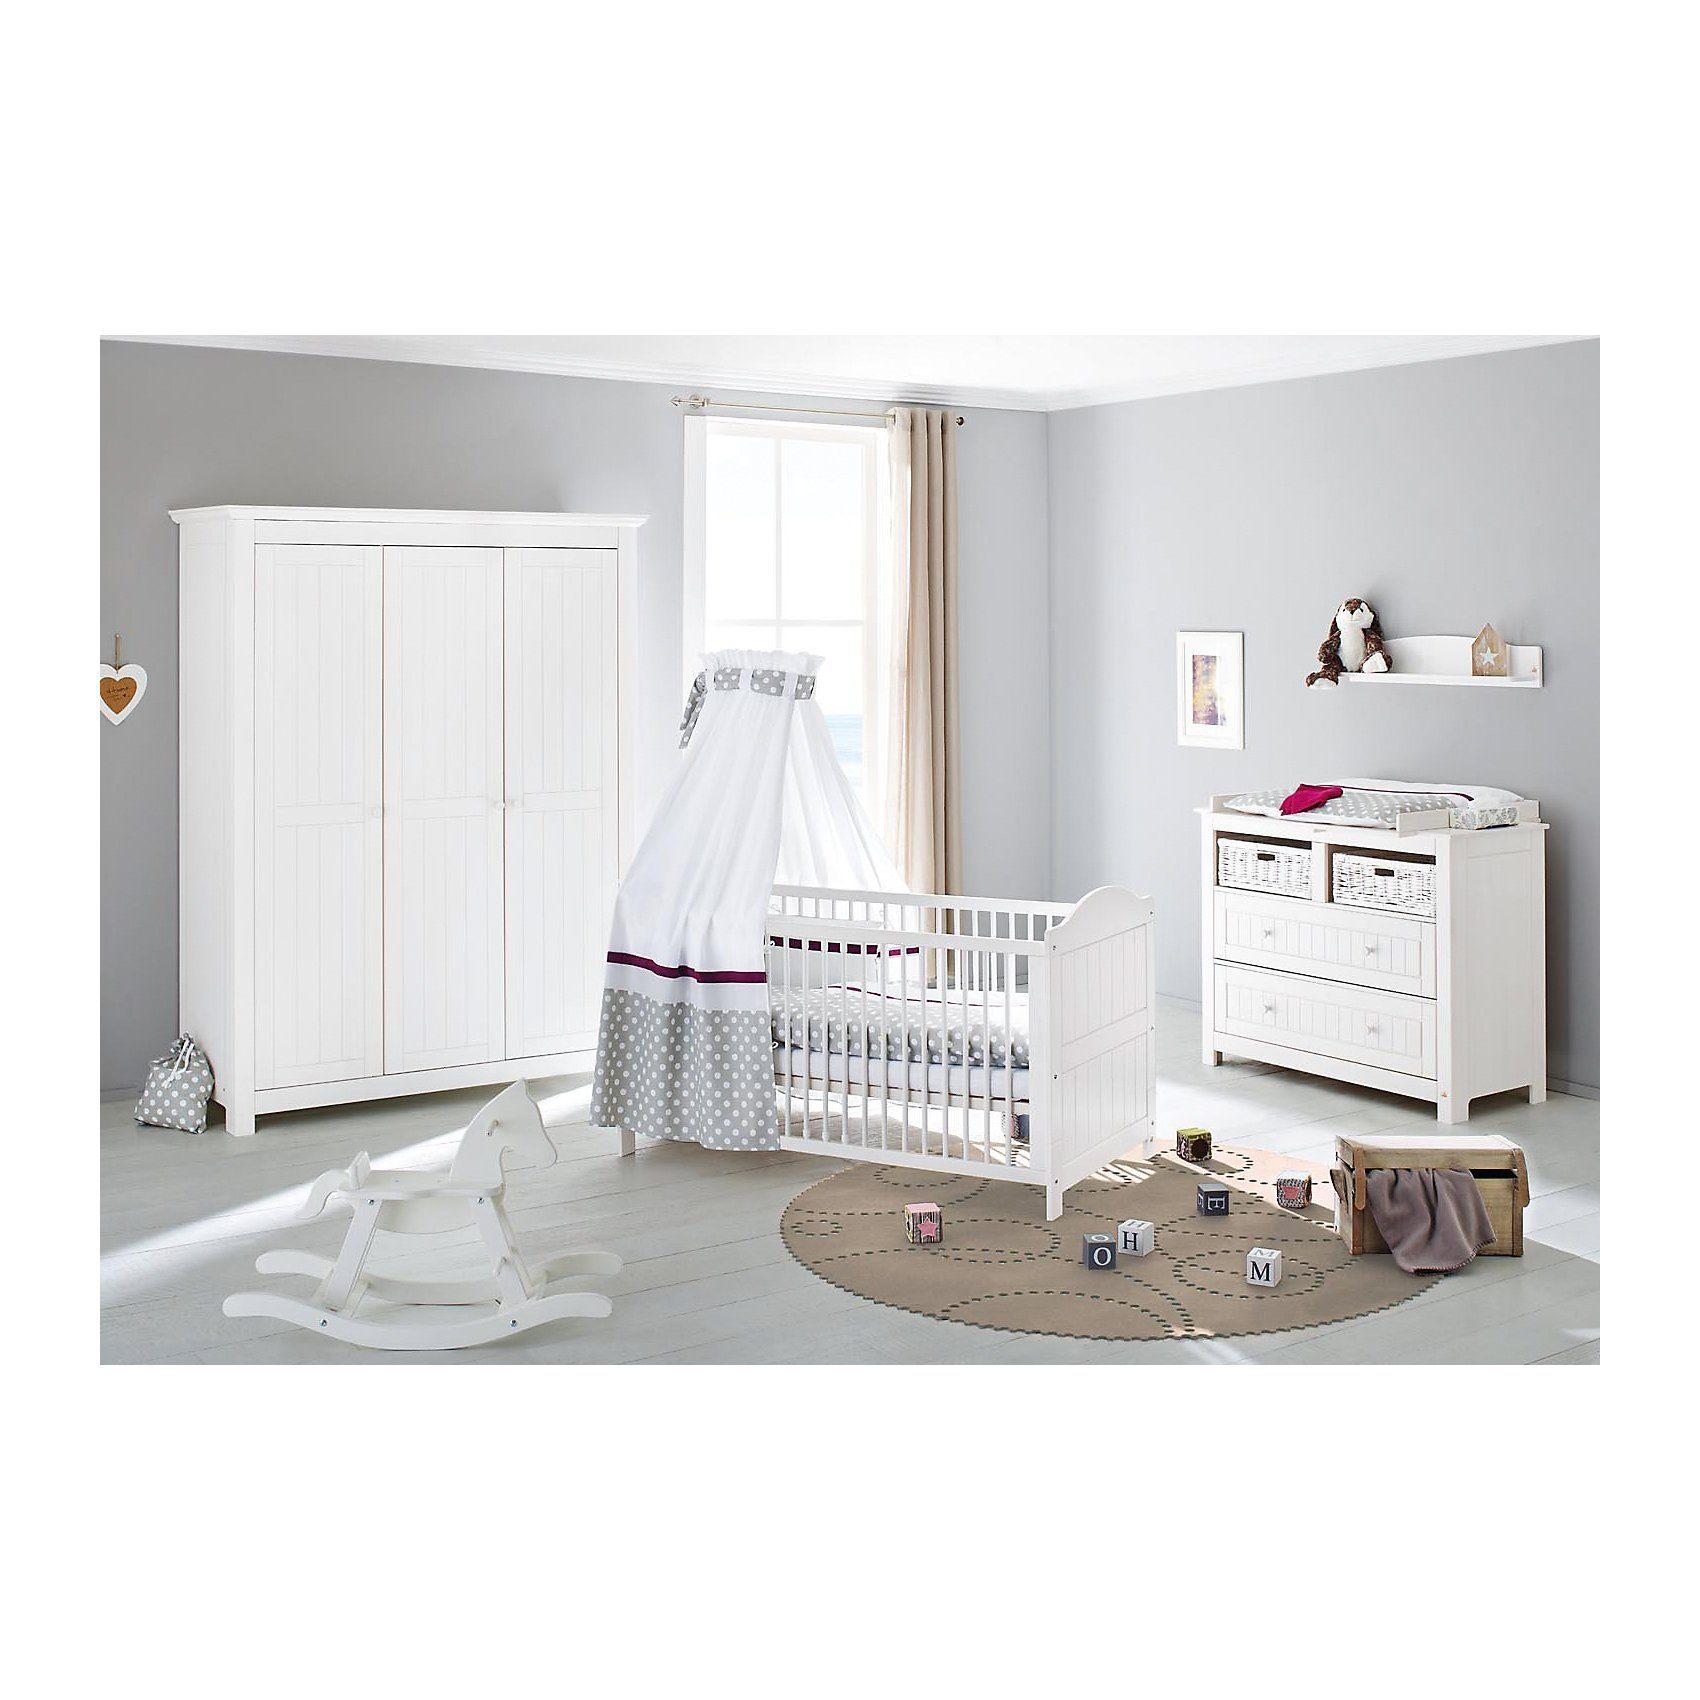 Pinolino Komplett Kinderzimmer NINA extrabreit/groß, (Kinderbett, Wic